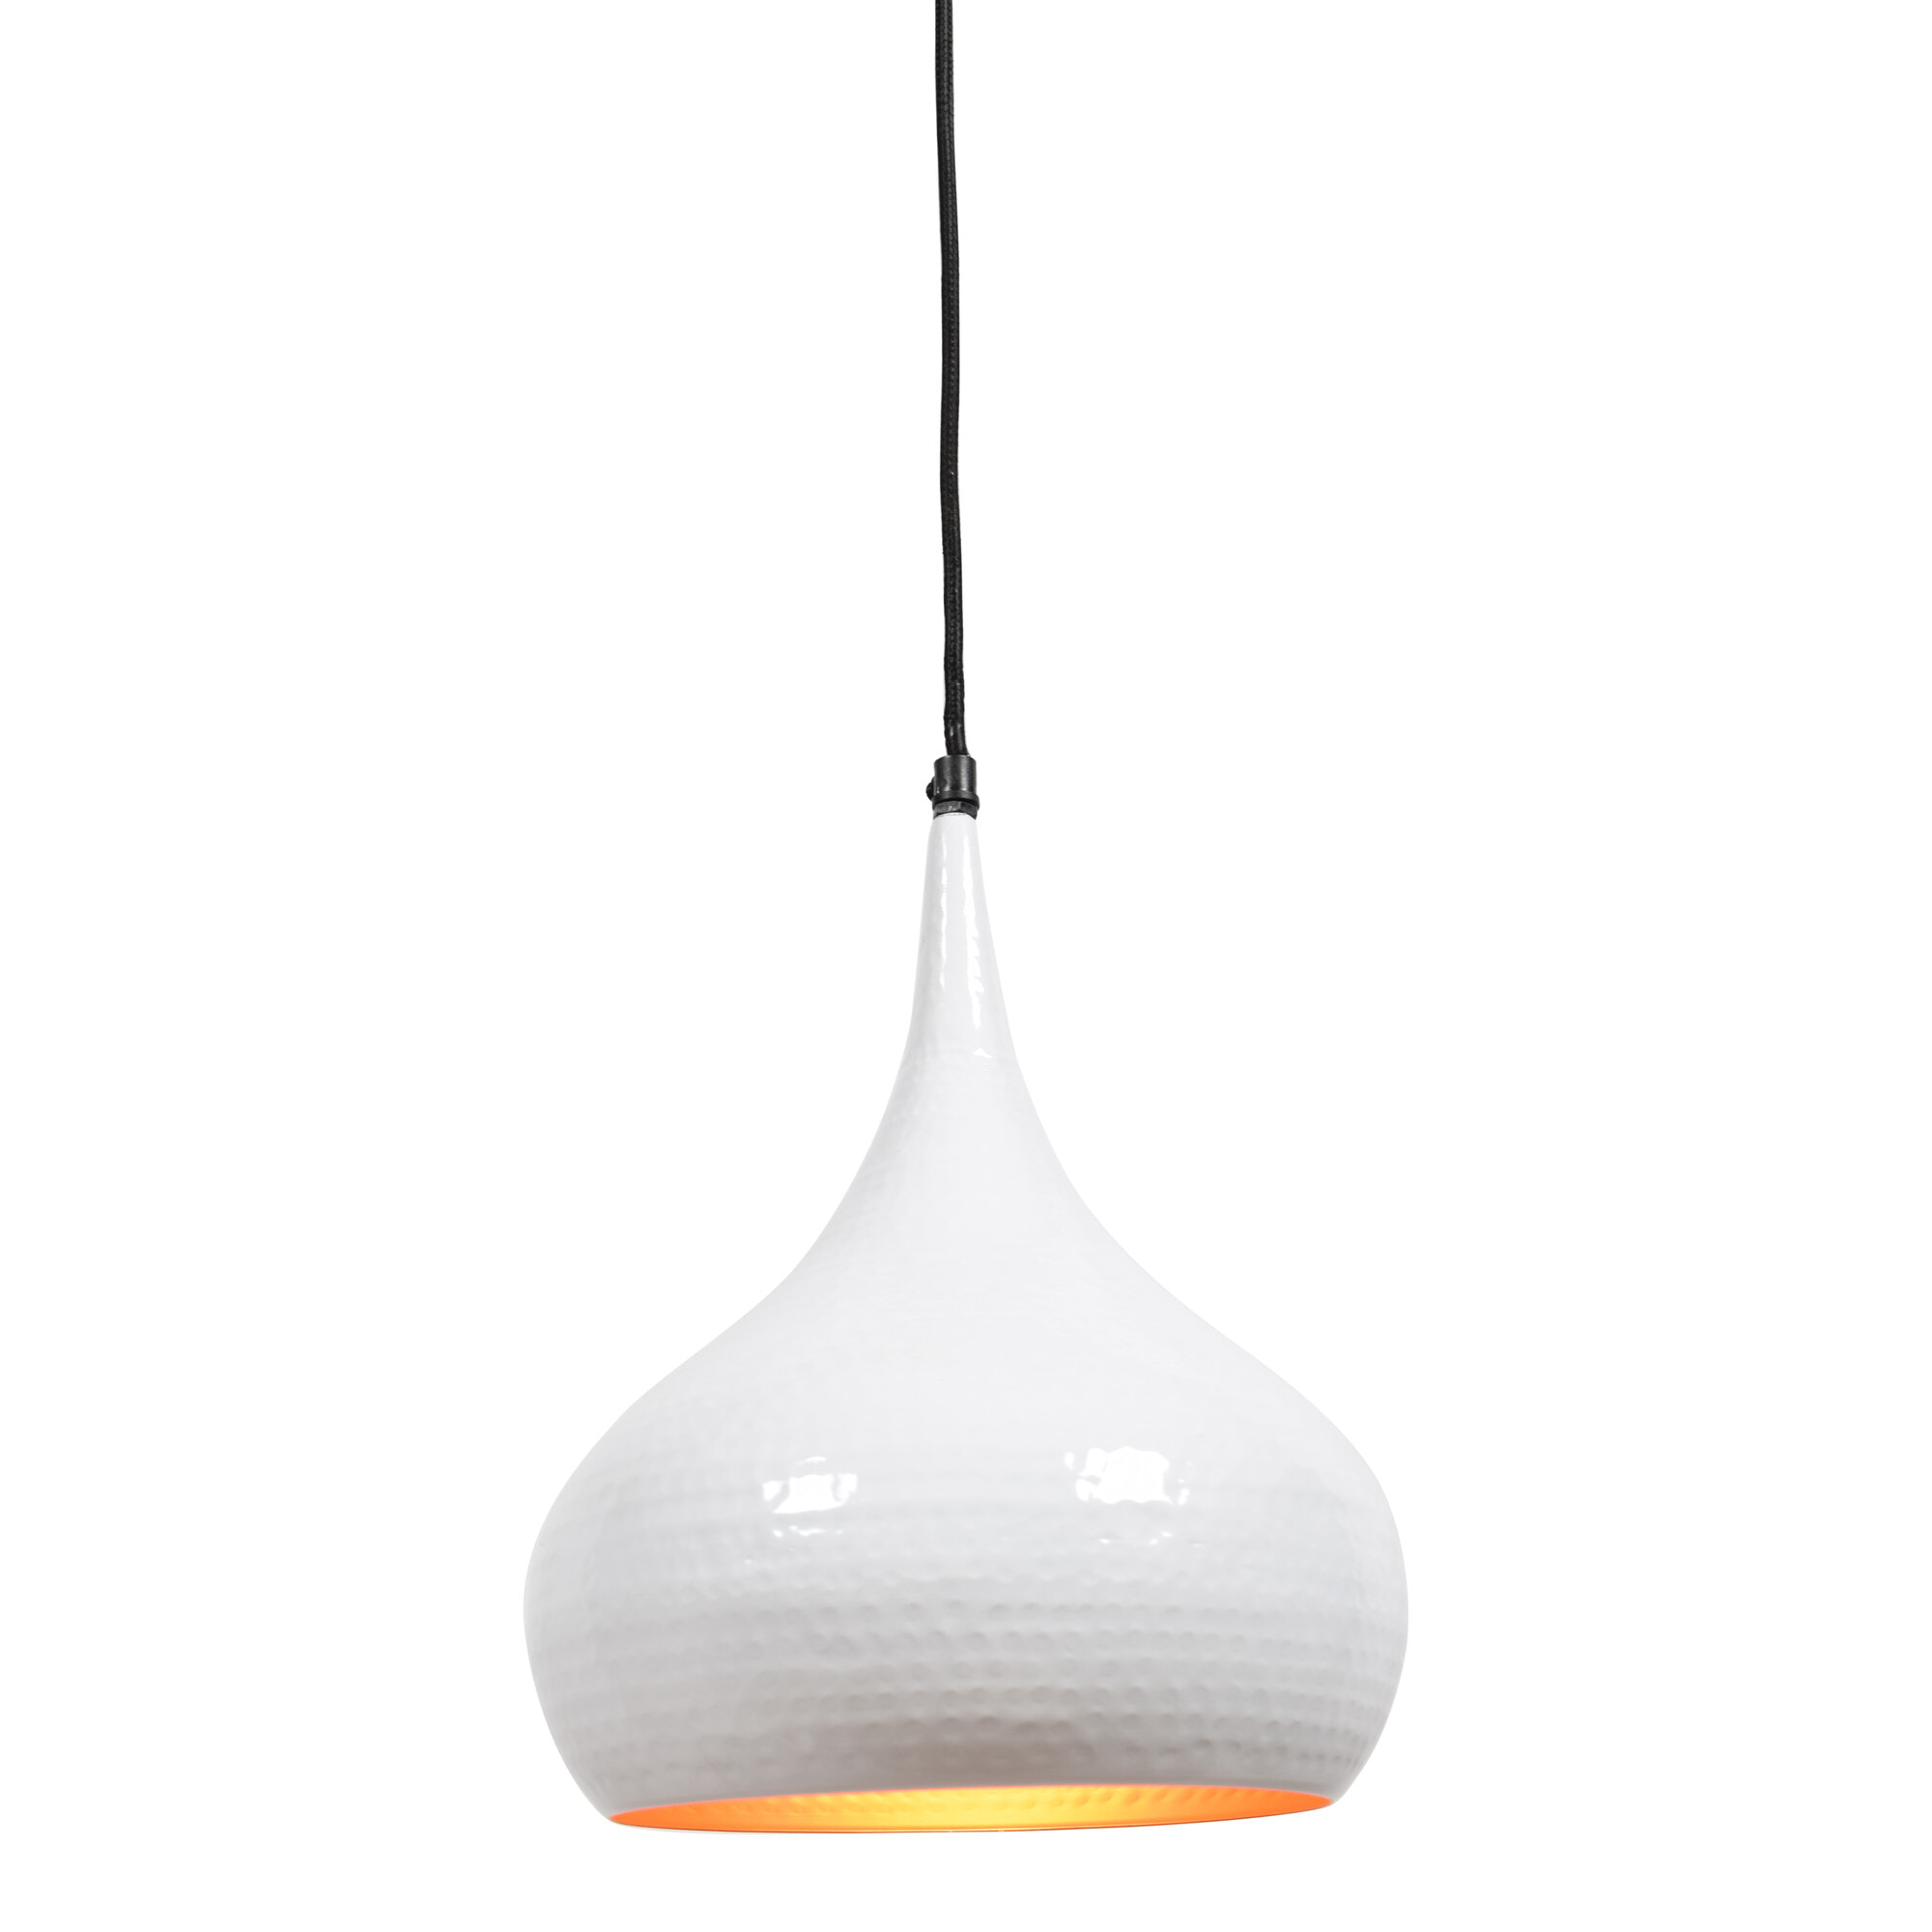 Urban Interiors Hanglamp Miem 24cm, kleur wit